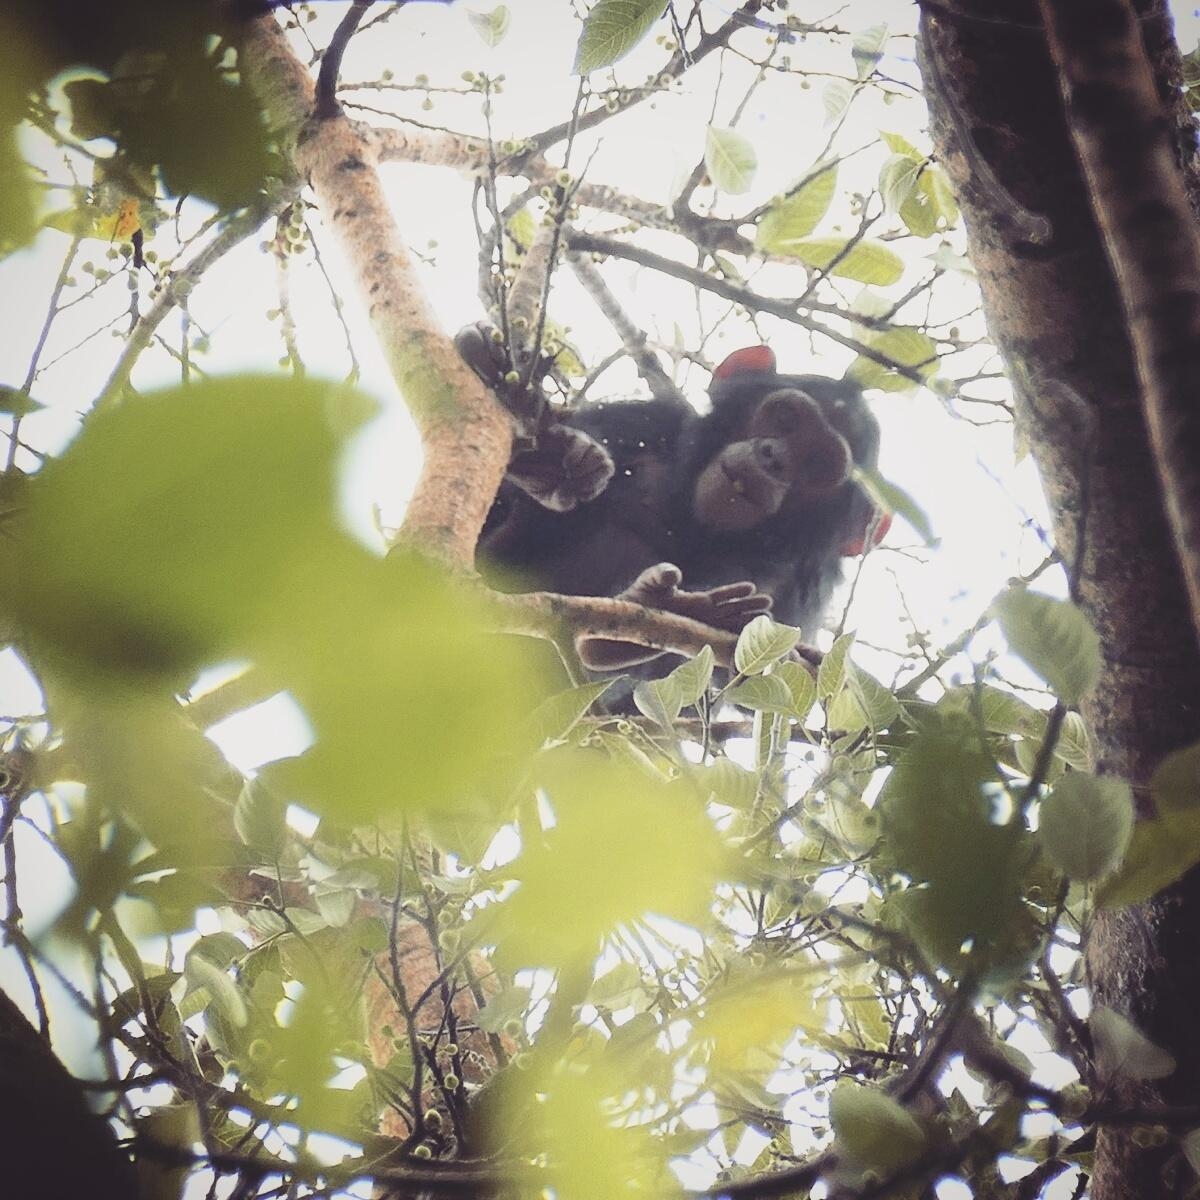 Chimpanzee in Uganda's Budongo Forest. Noah Strycker